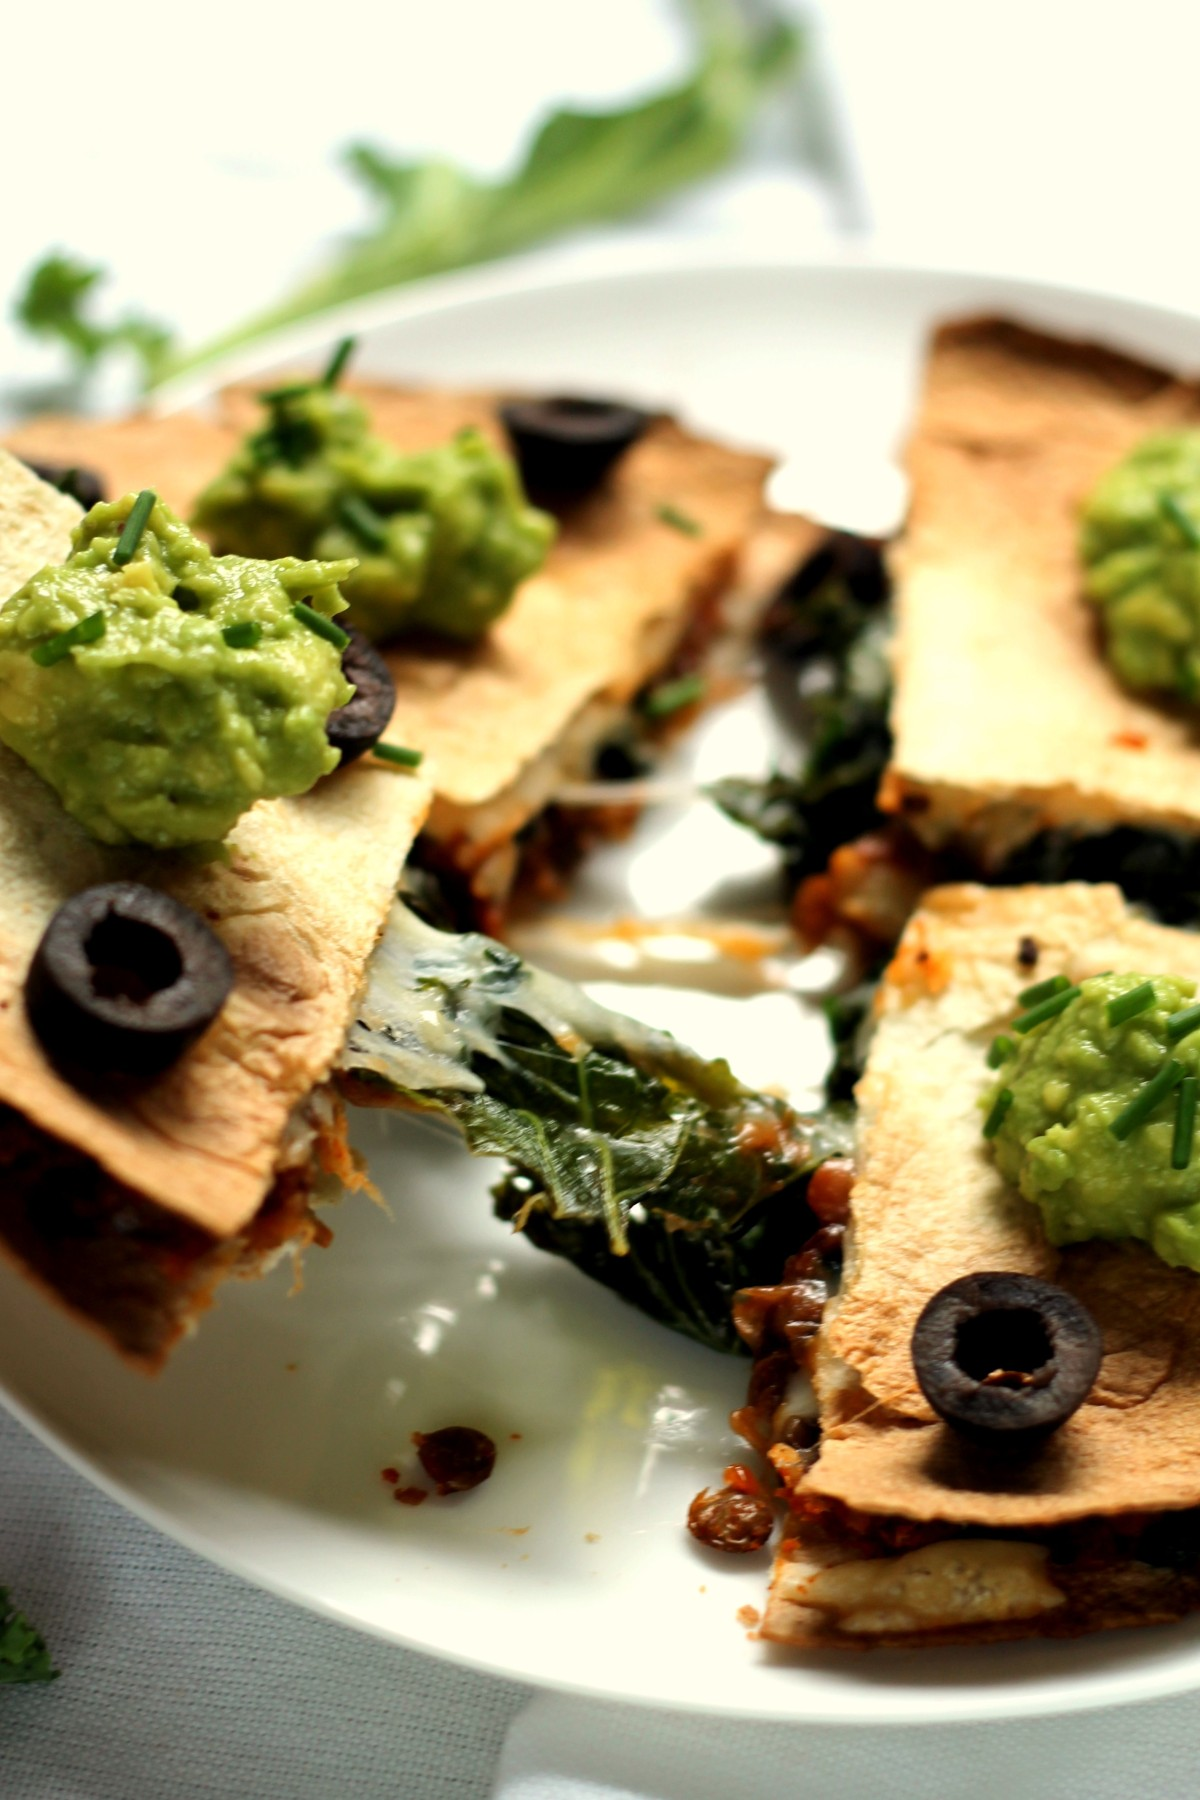 Lentil, kale and provolone quesadillas | Ciao Veggie